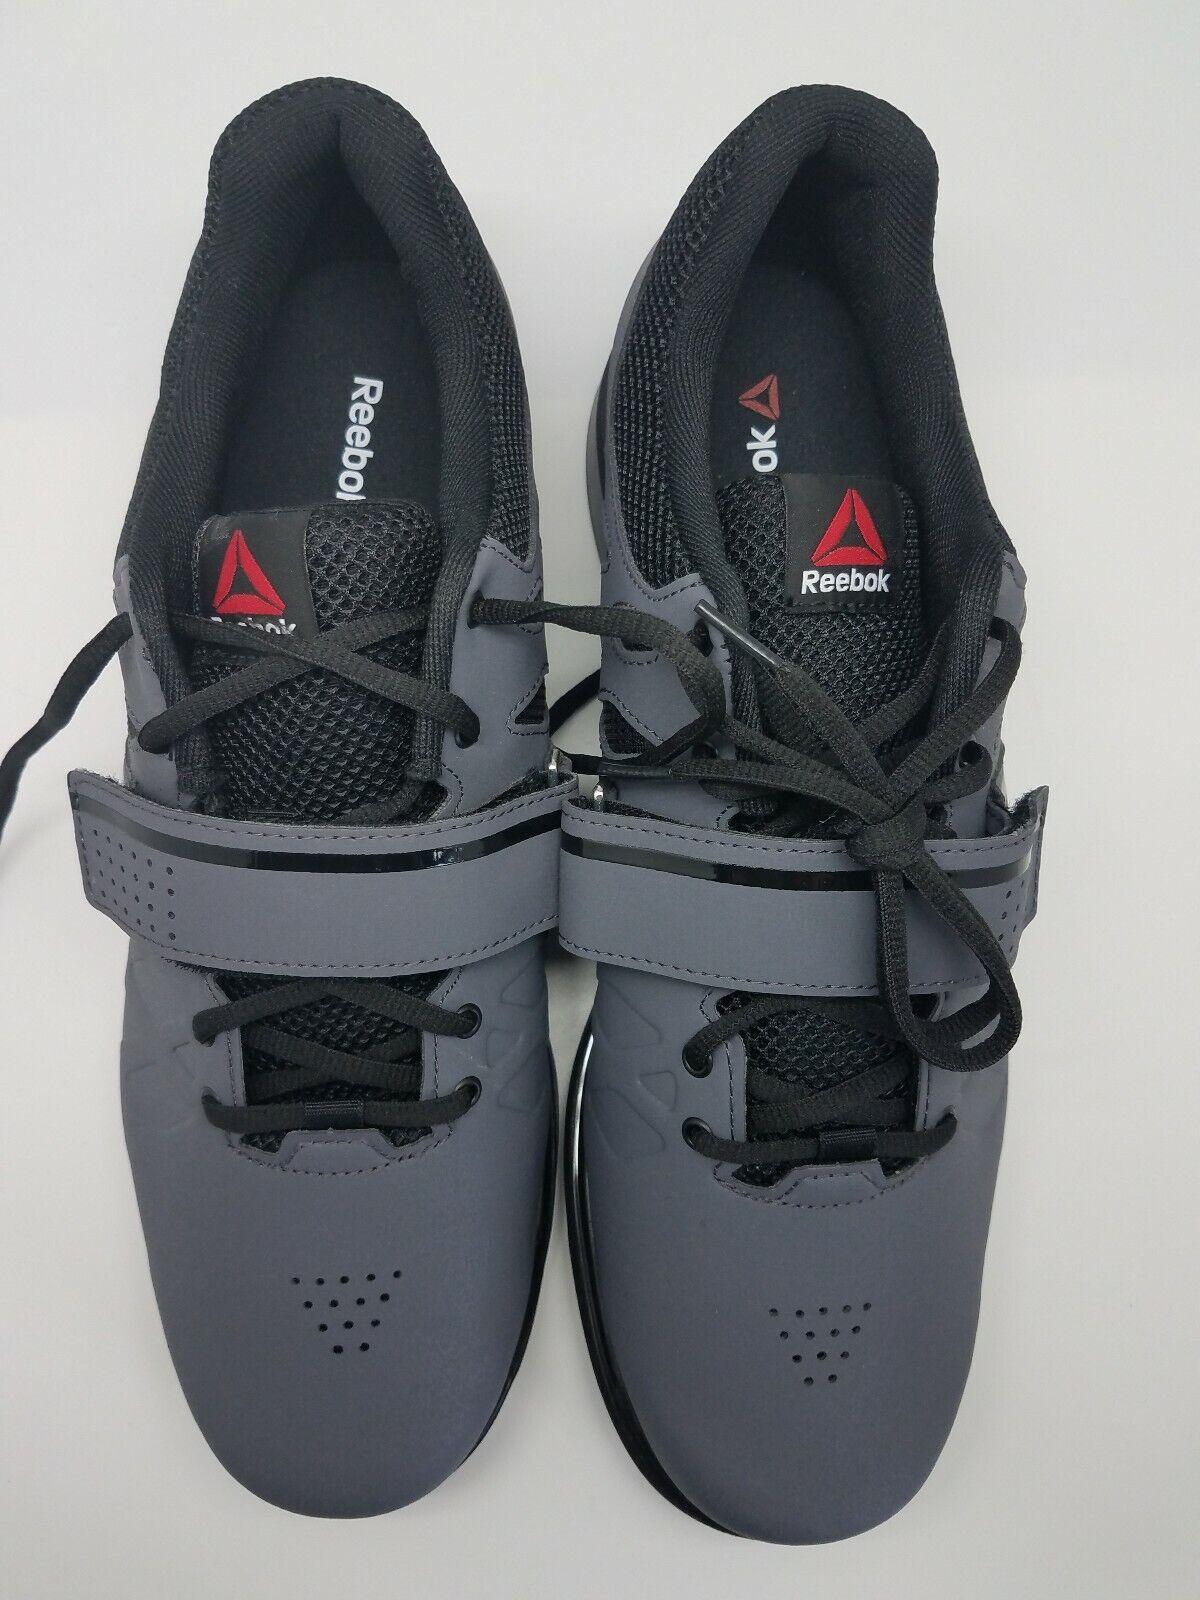 New. BD2631Mens Reebok Lifter PR - Weightlifting, Mountain Biking, Training shoes